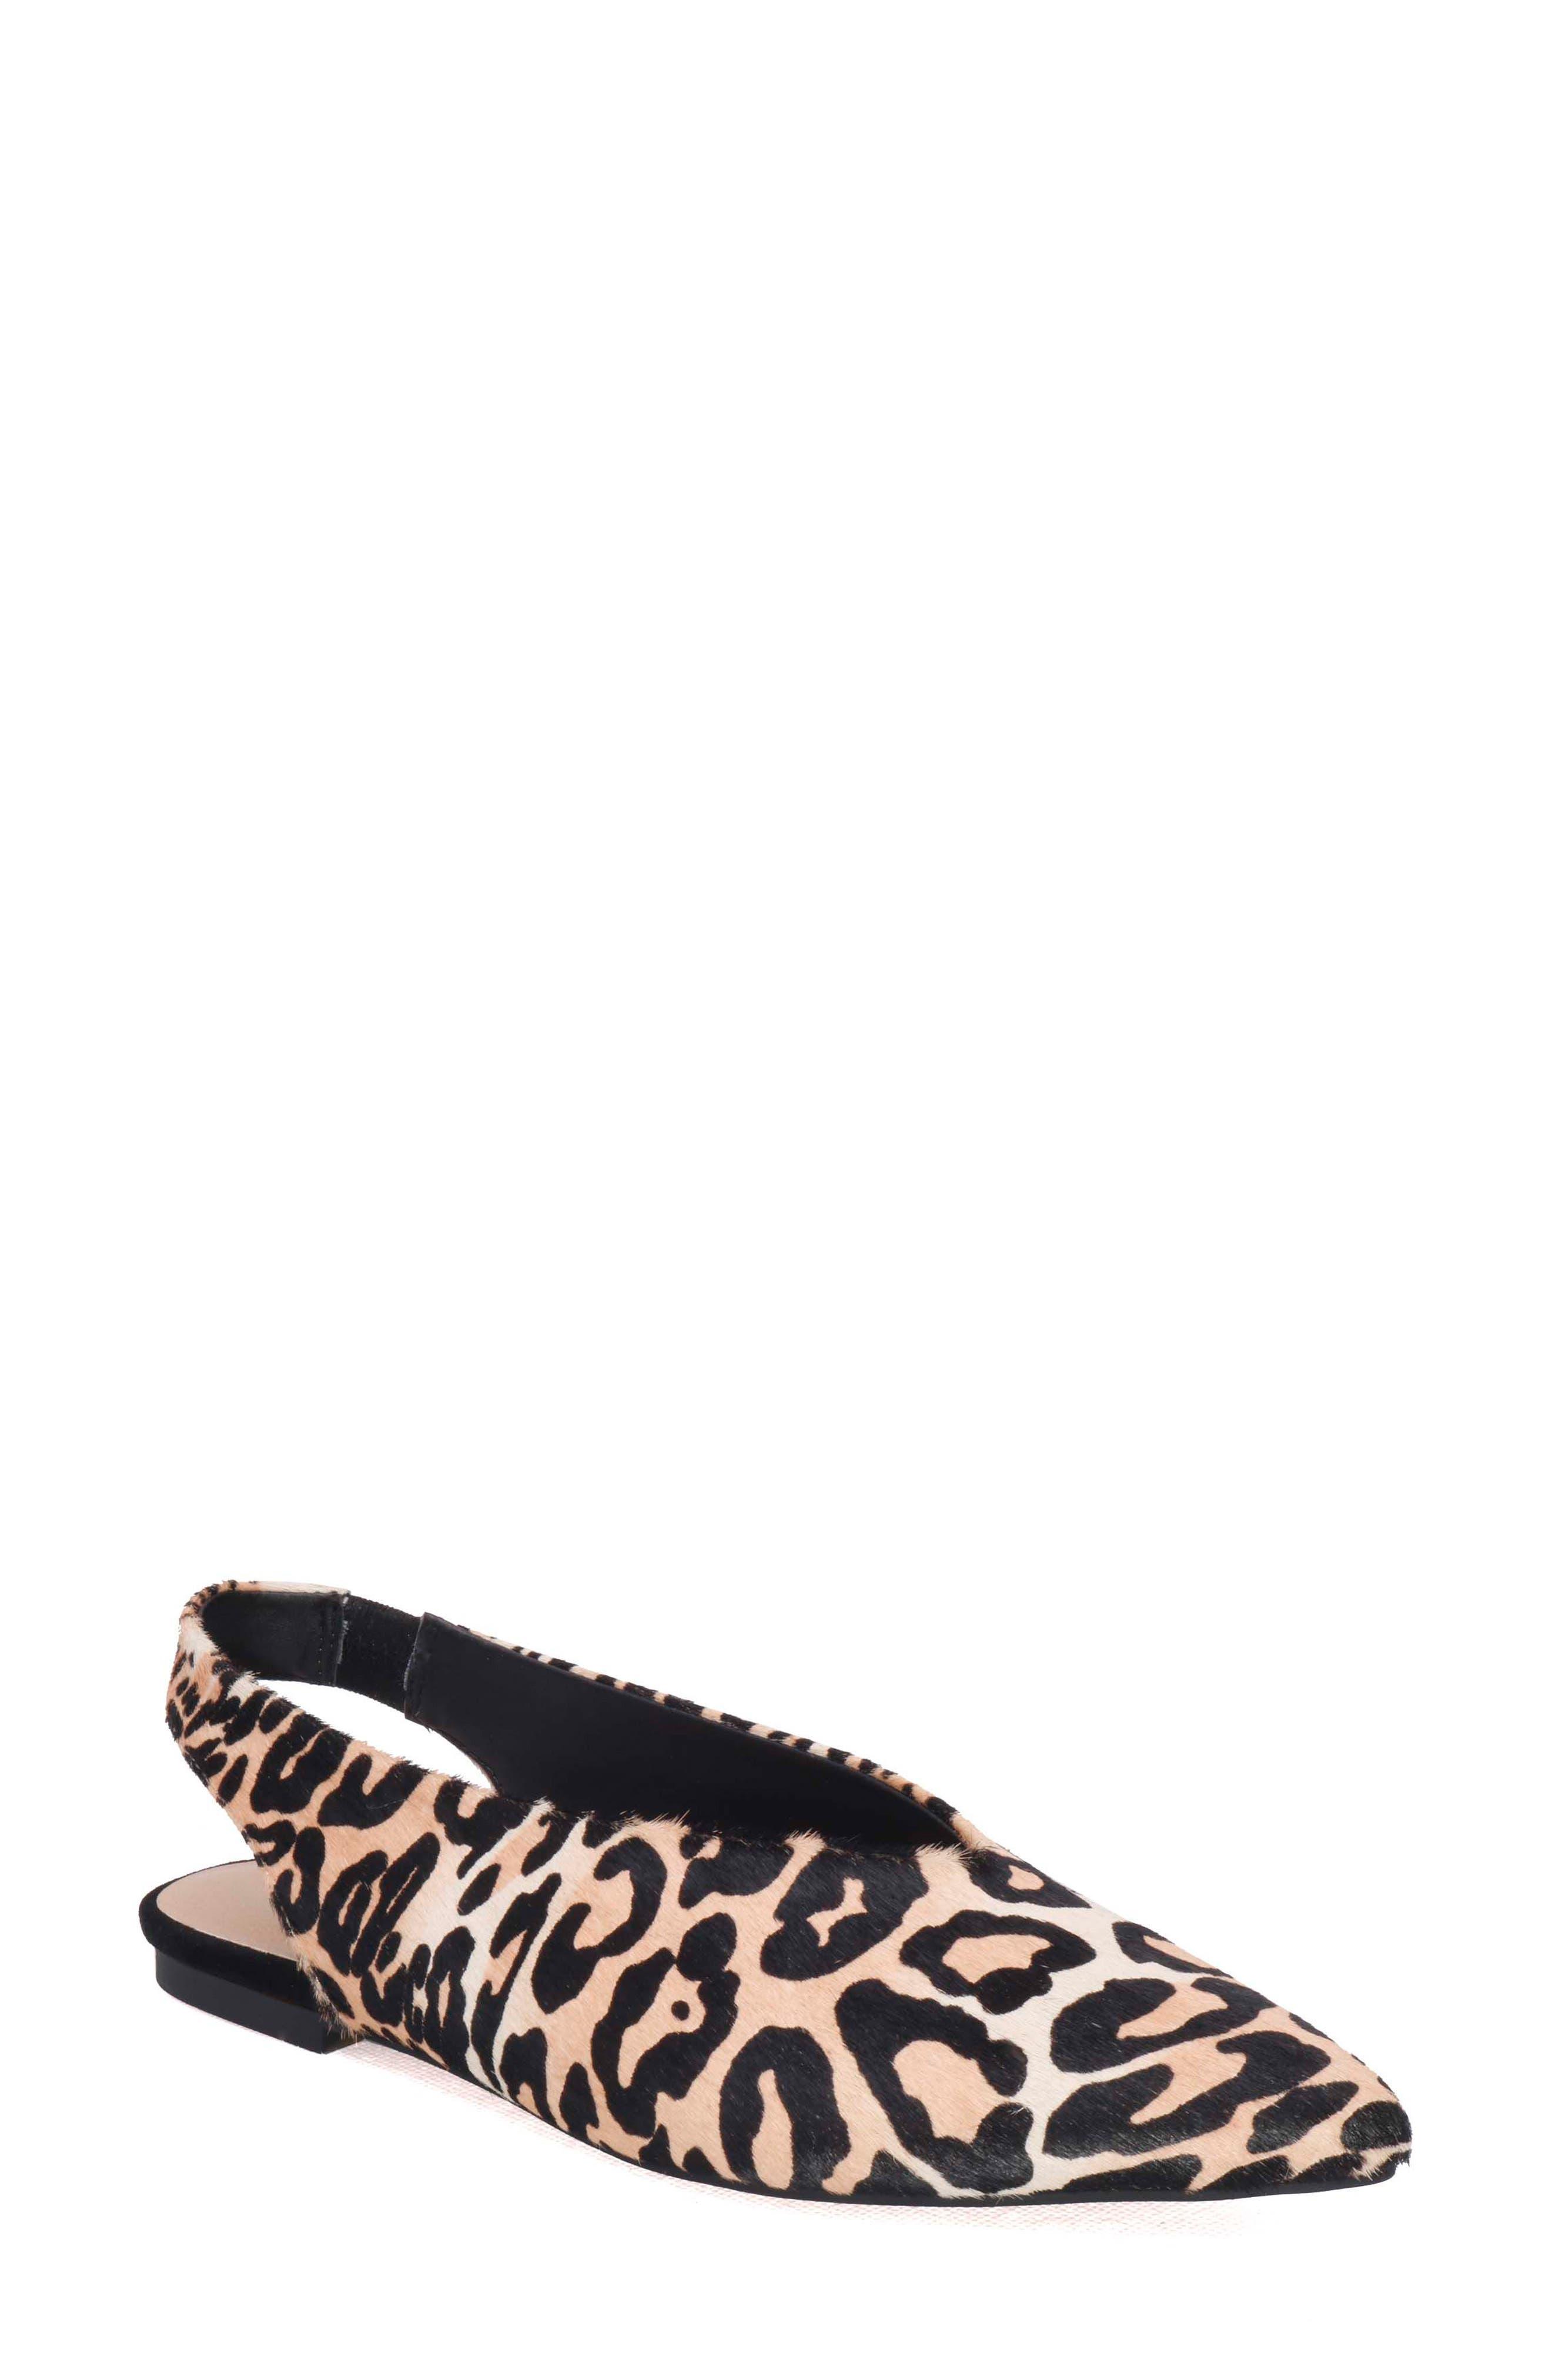 Violet Genuine Calf Hair Slingback Flat,                         Main,                         color, Leopard Calf Hair